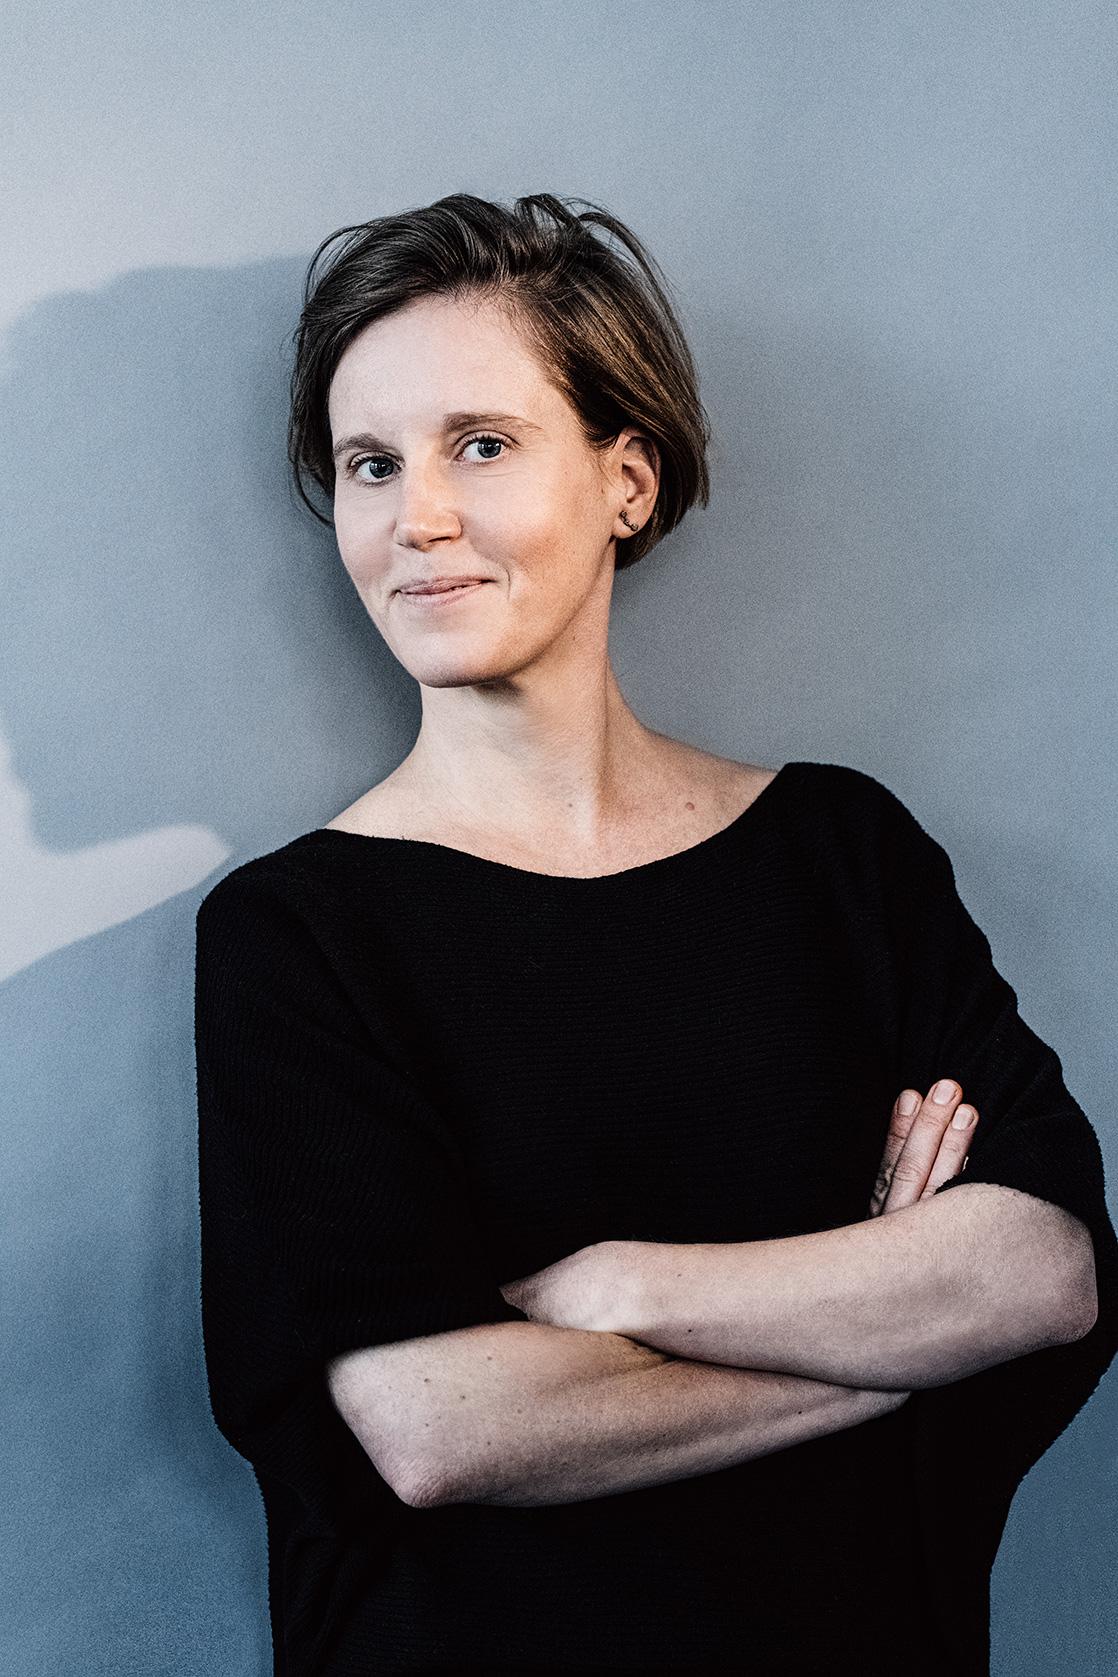 Stefanie Kolb